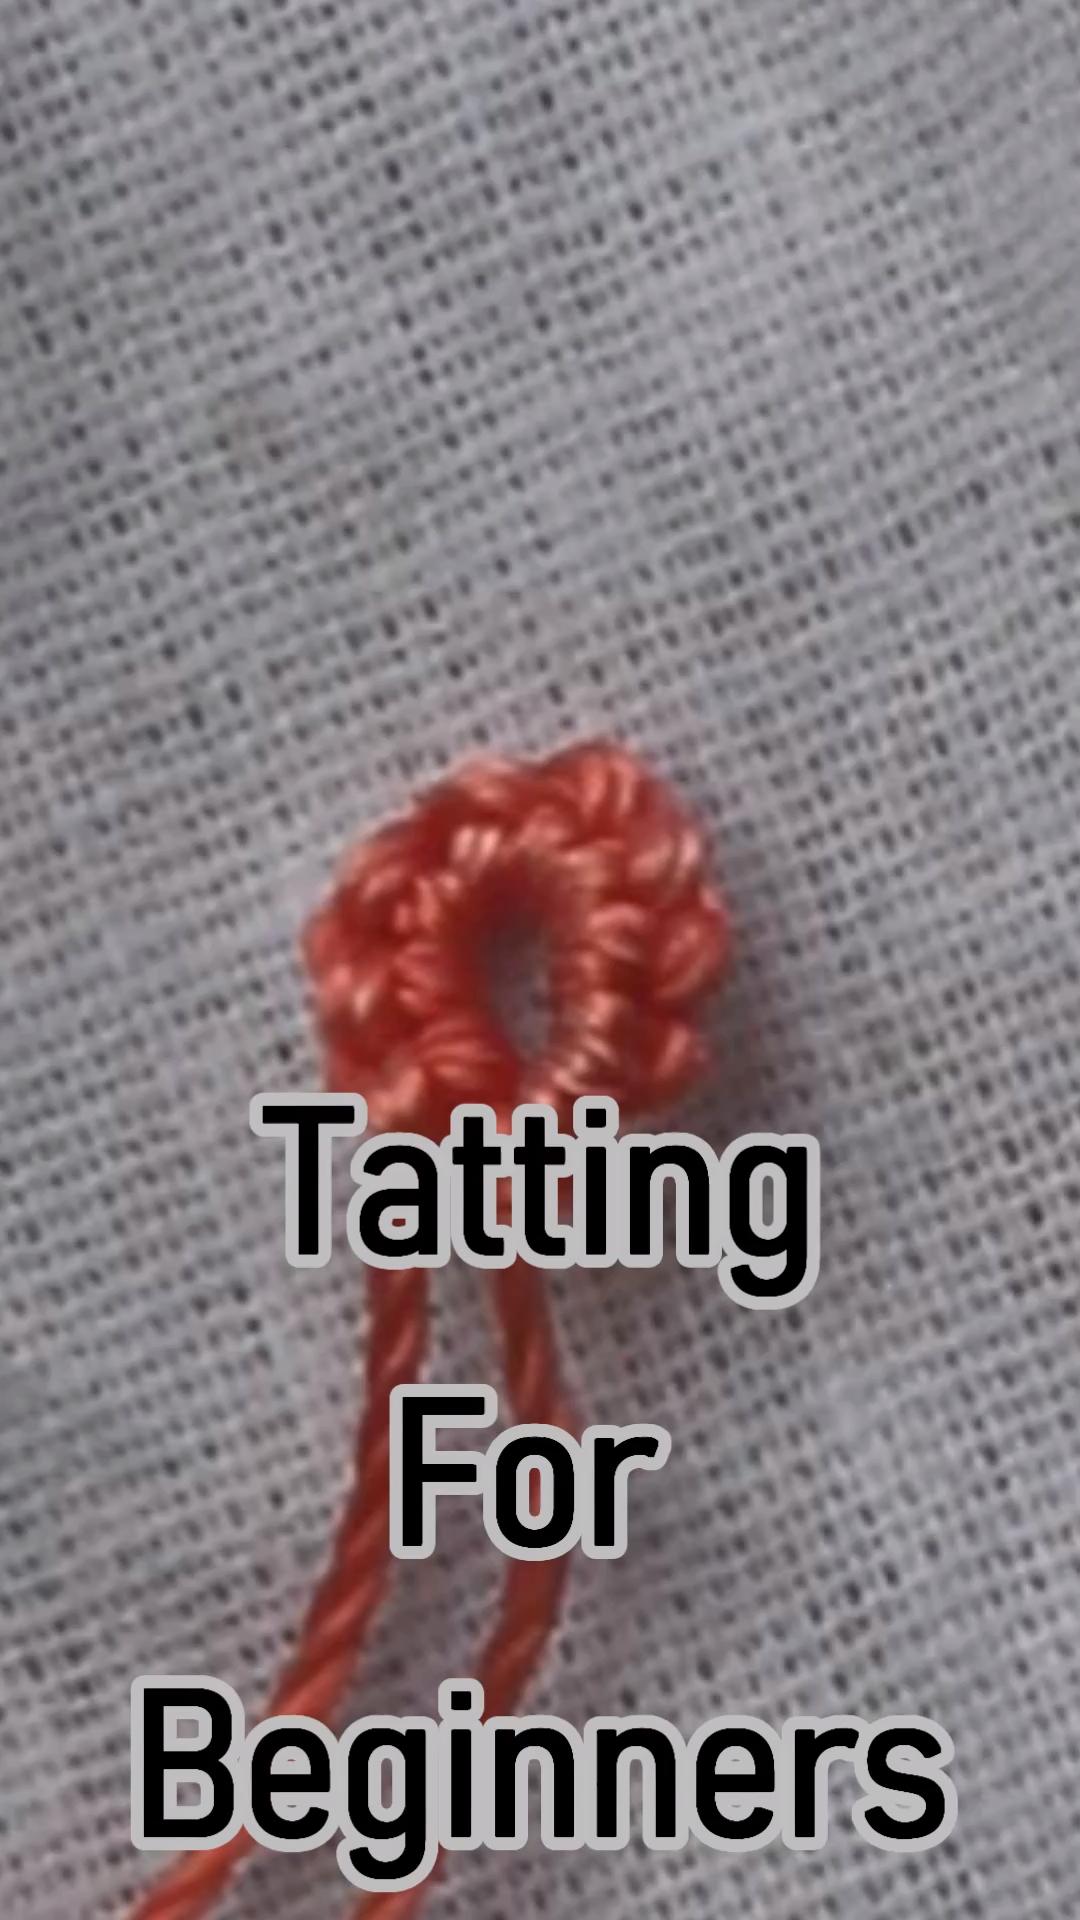 #Tatting For beginners #tatting